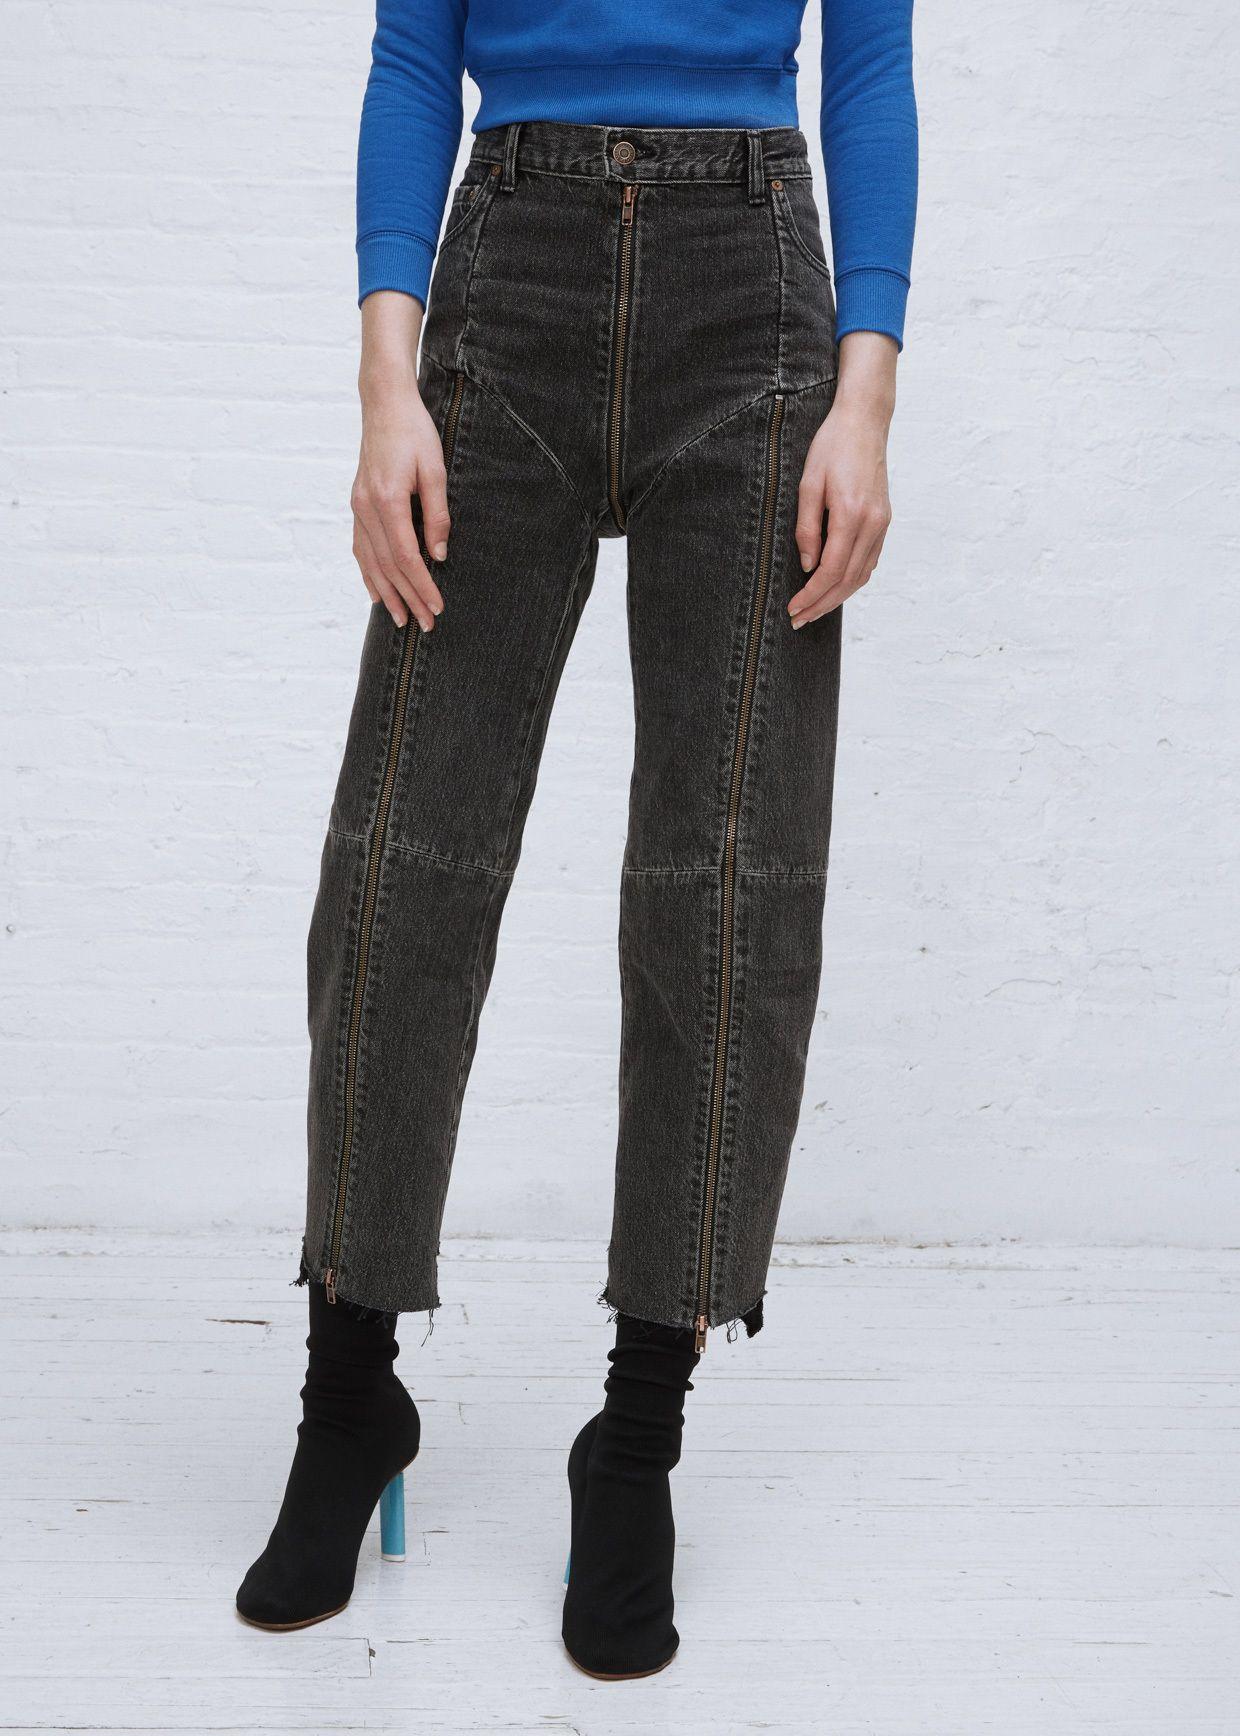 Levis Bayan Jean Pantolon Skinny 1 Skinny Levis Pantolon